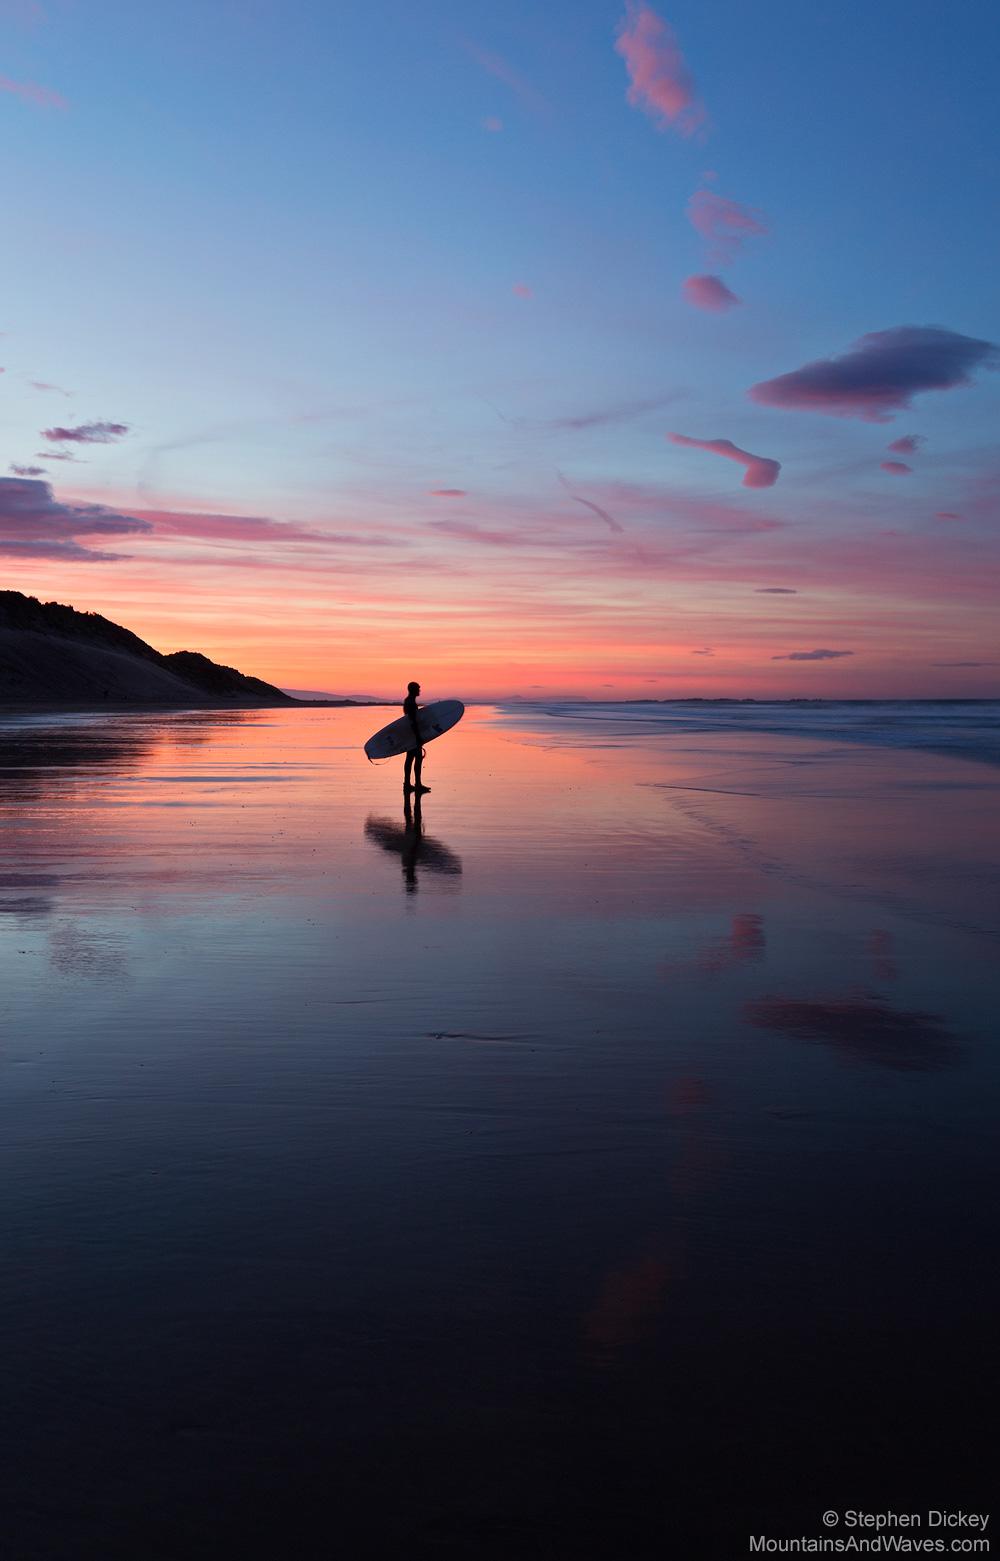 The Surfer, Portrush, County Antrim, Northern Ireland